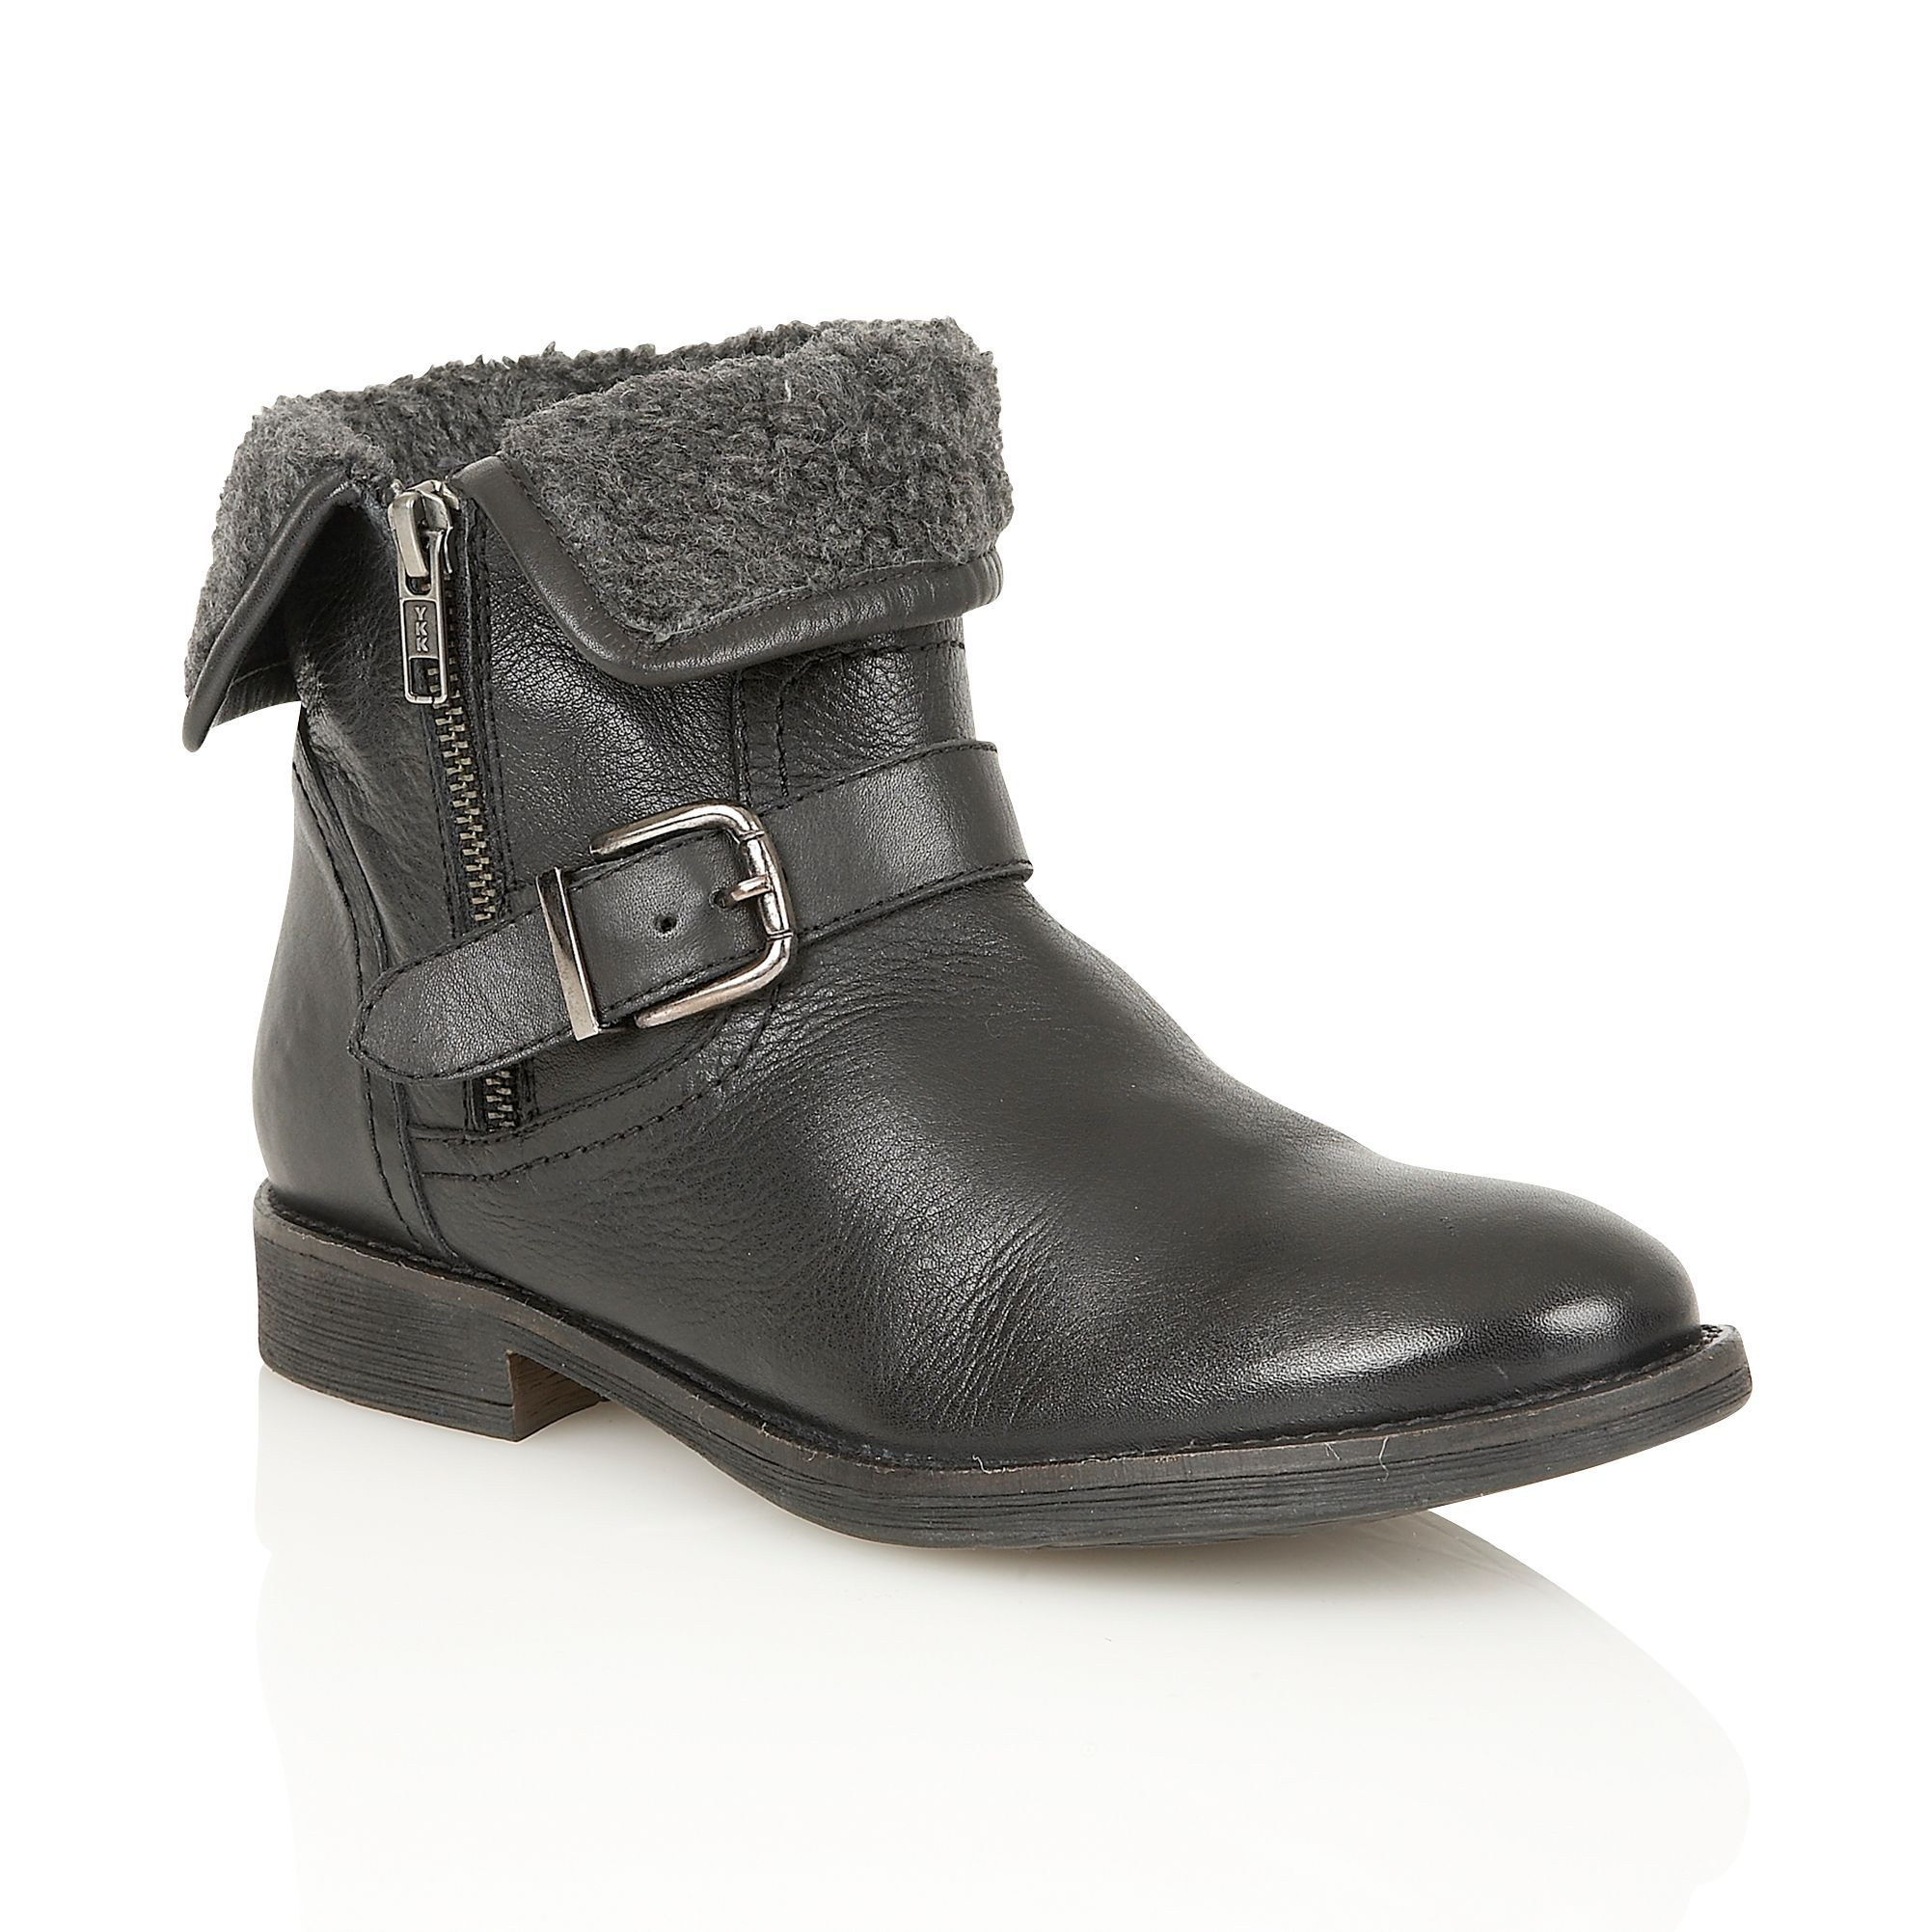 Lotus Annabeth ankle boots, Black